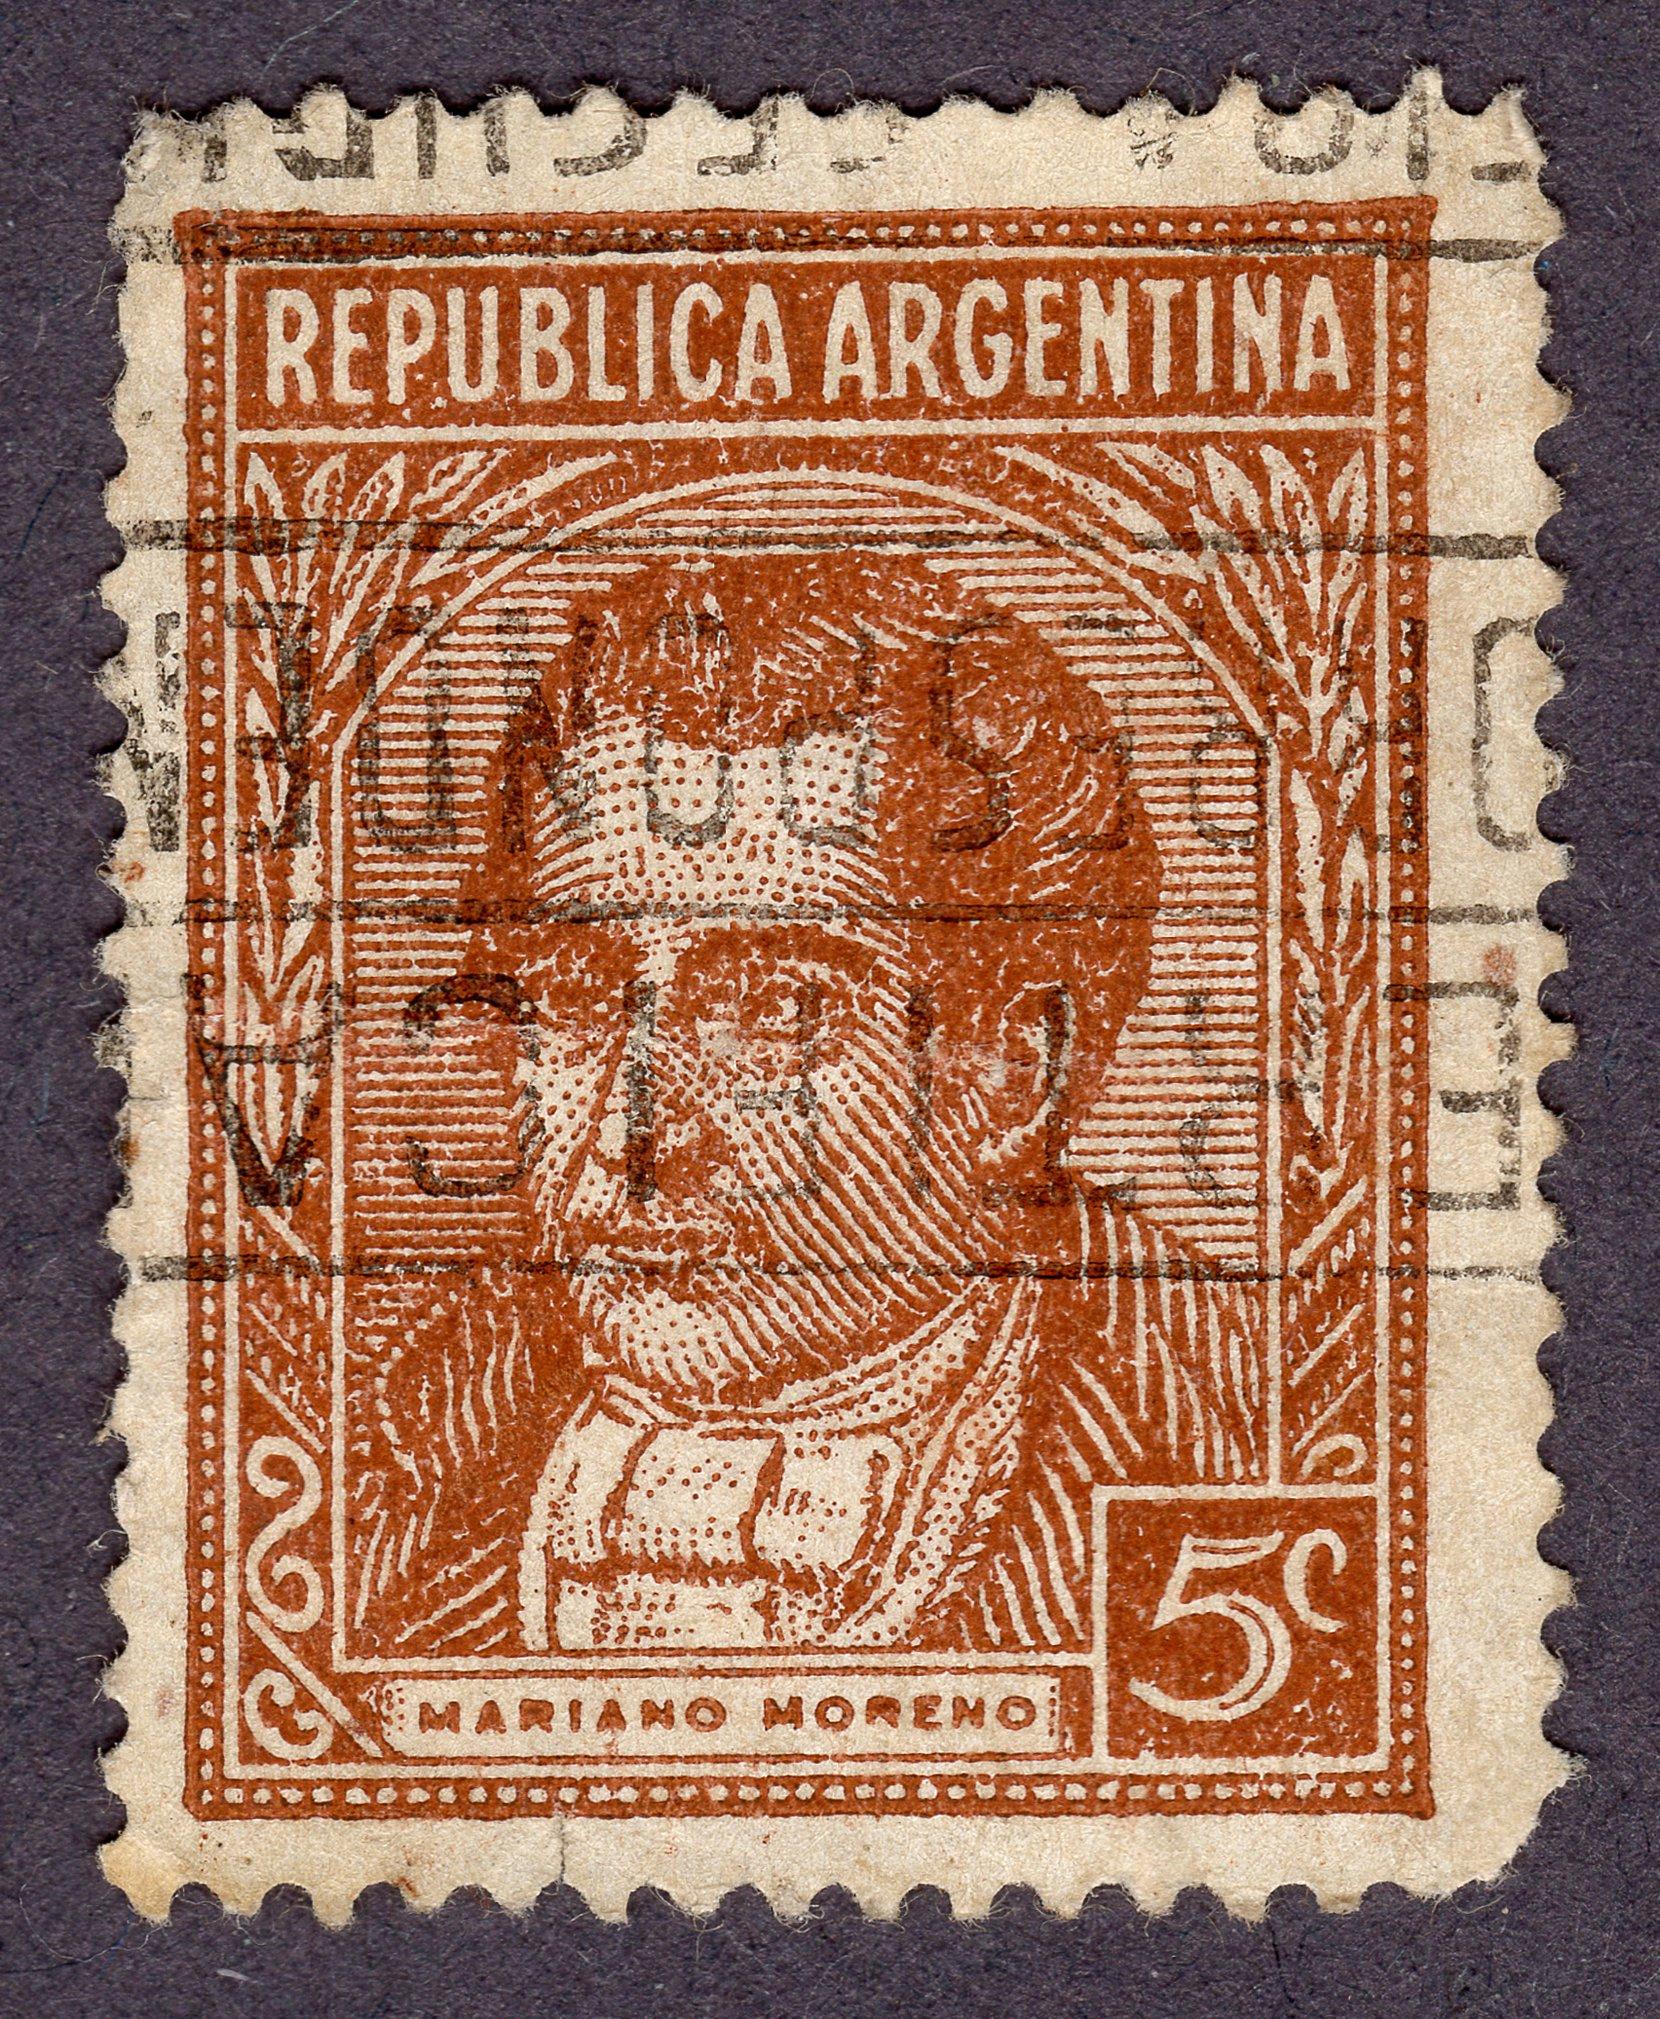 mariano moreno, republica argentina philately revenue stamps